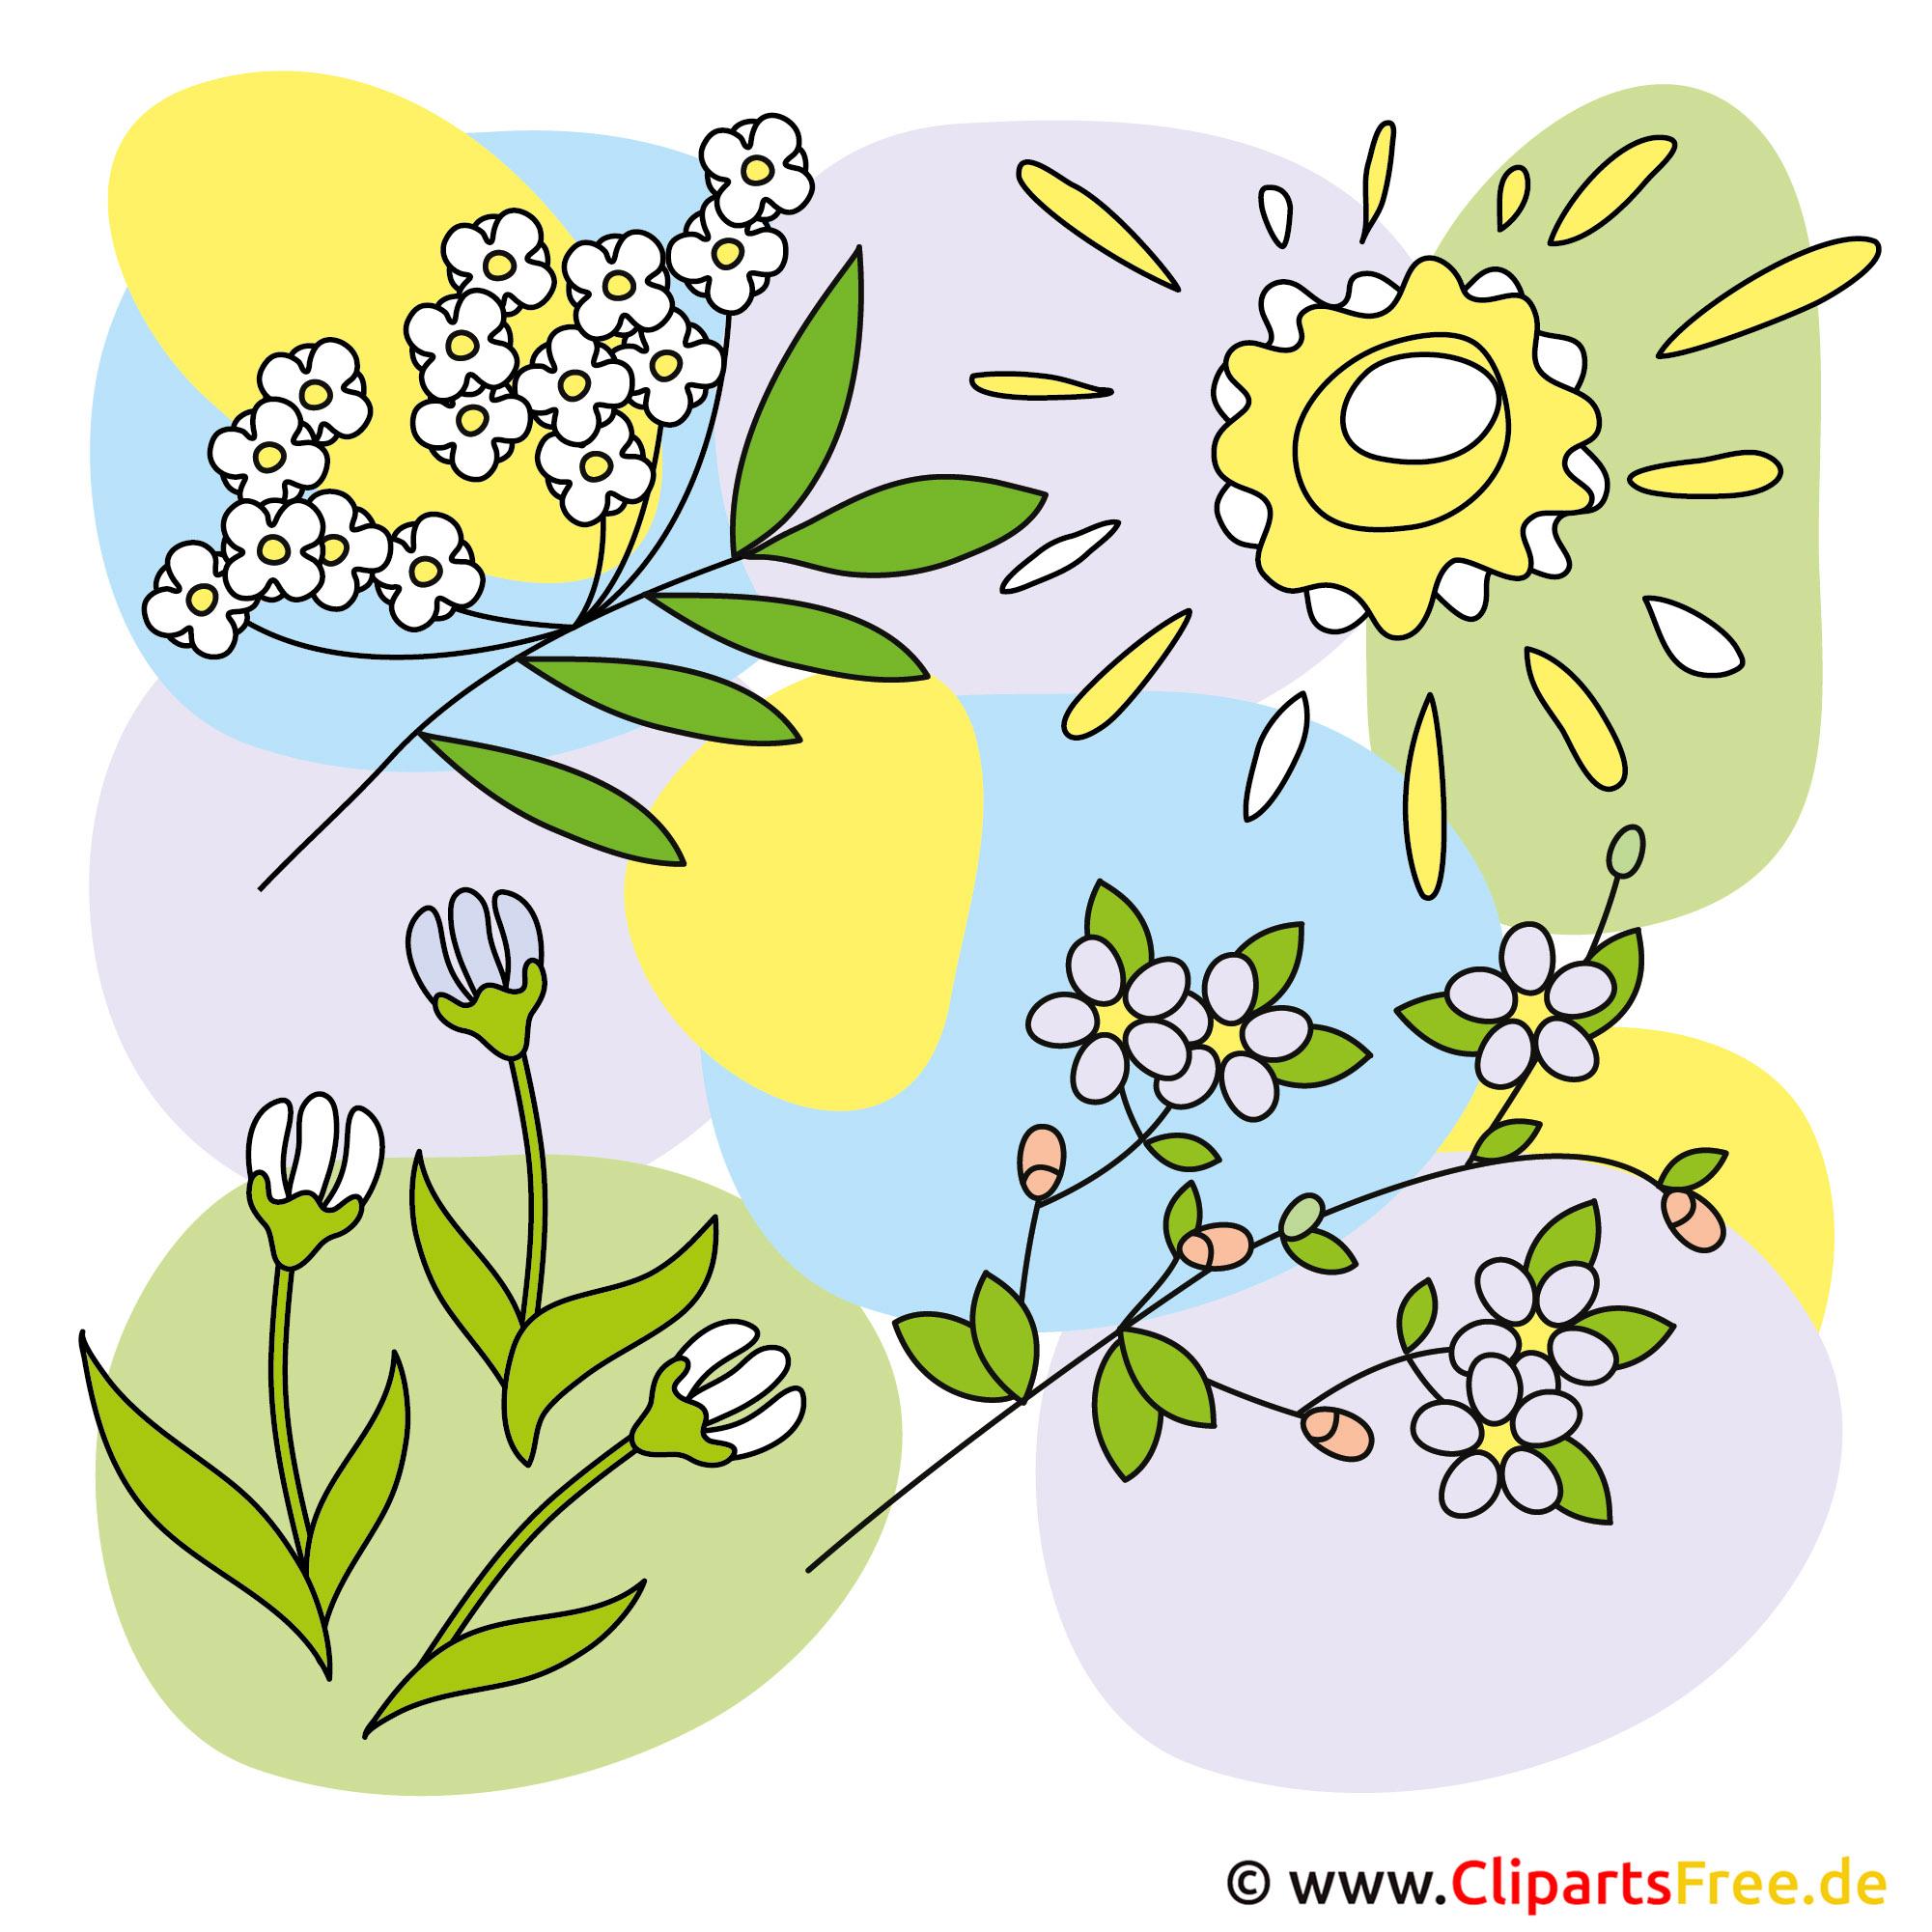 Blumen - Frühling Cliparts kostenlos